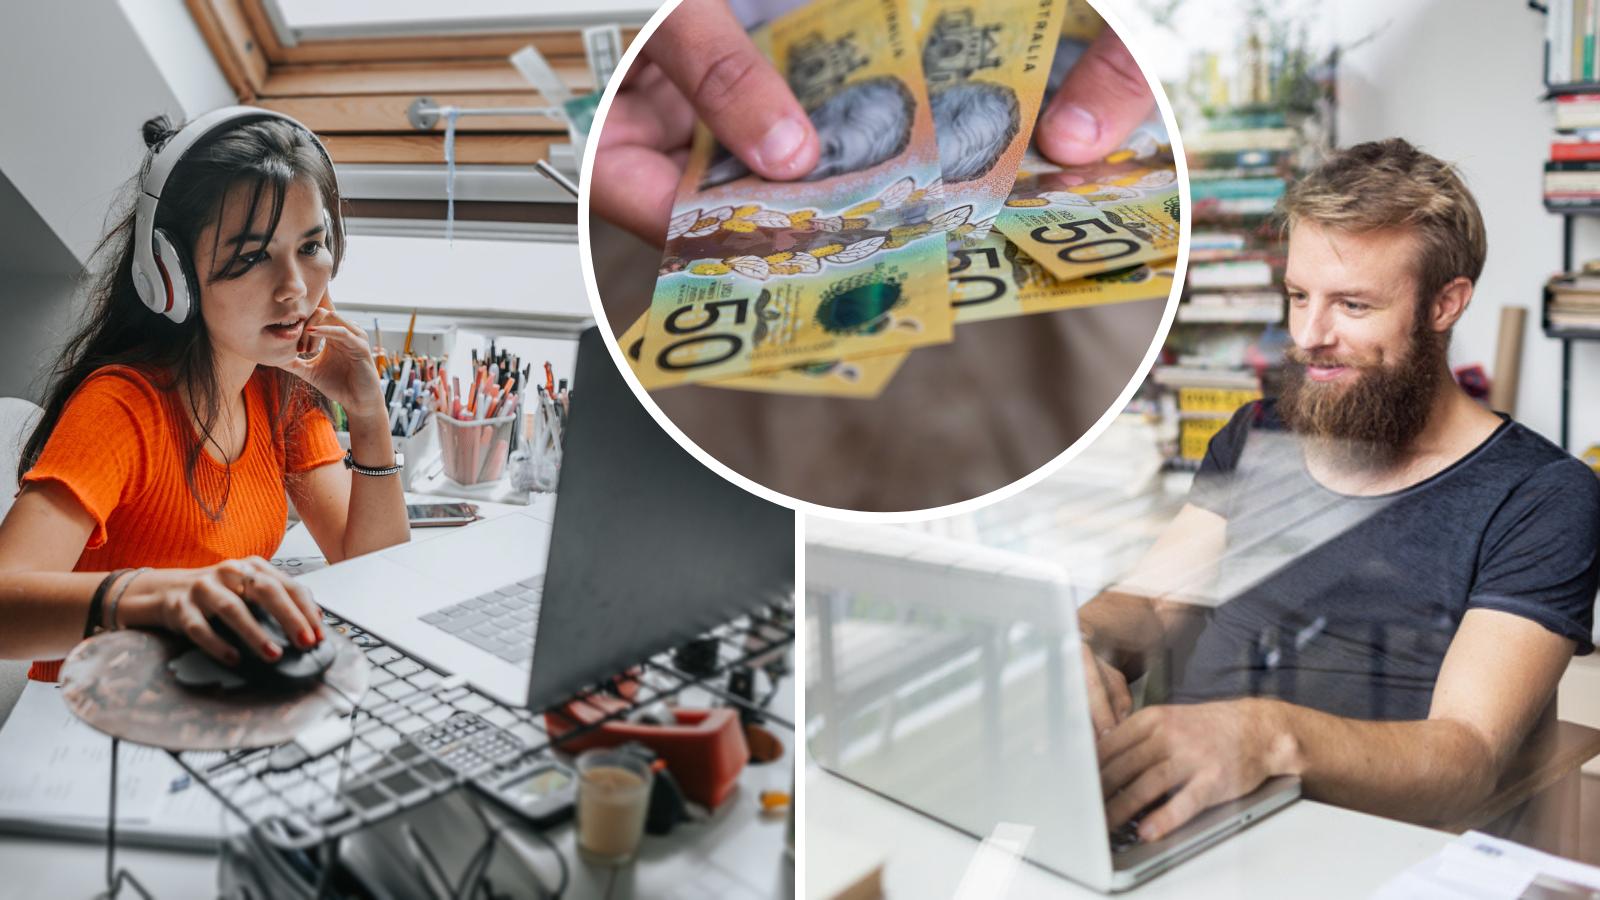 $650 per job: Australia's best-paying side hustles revealed